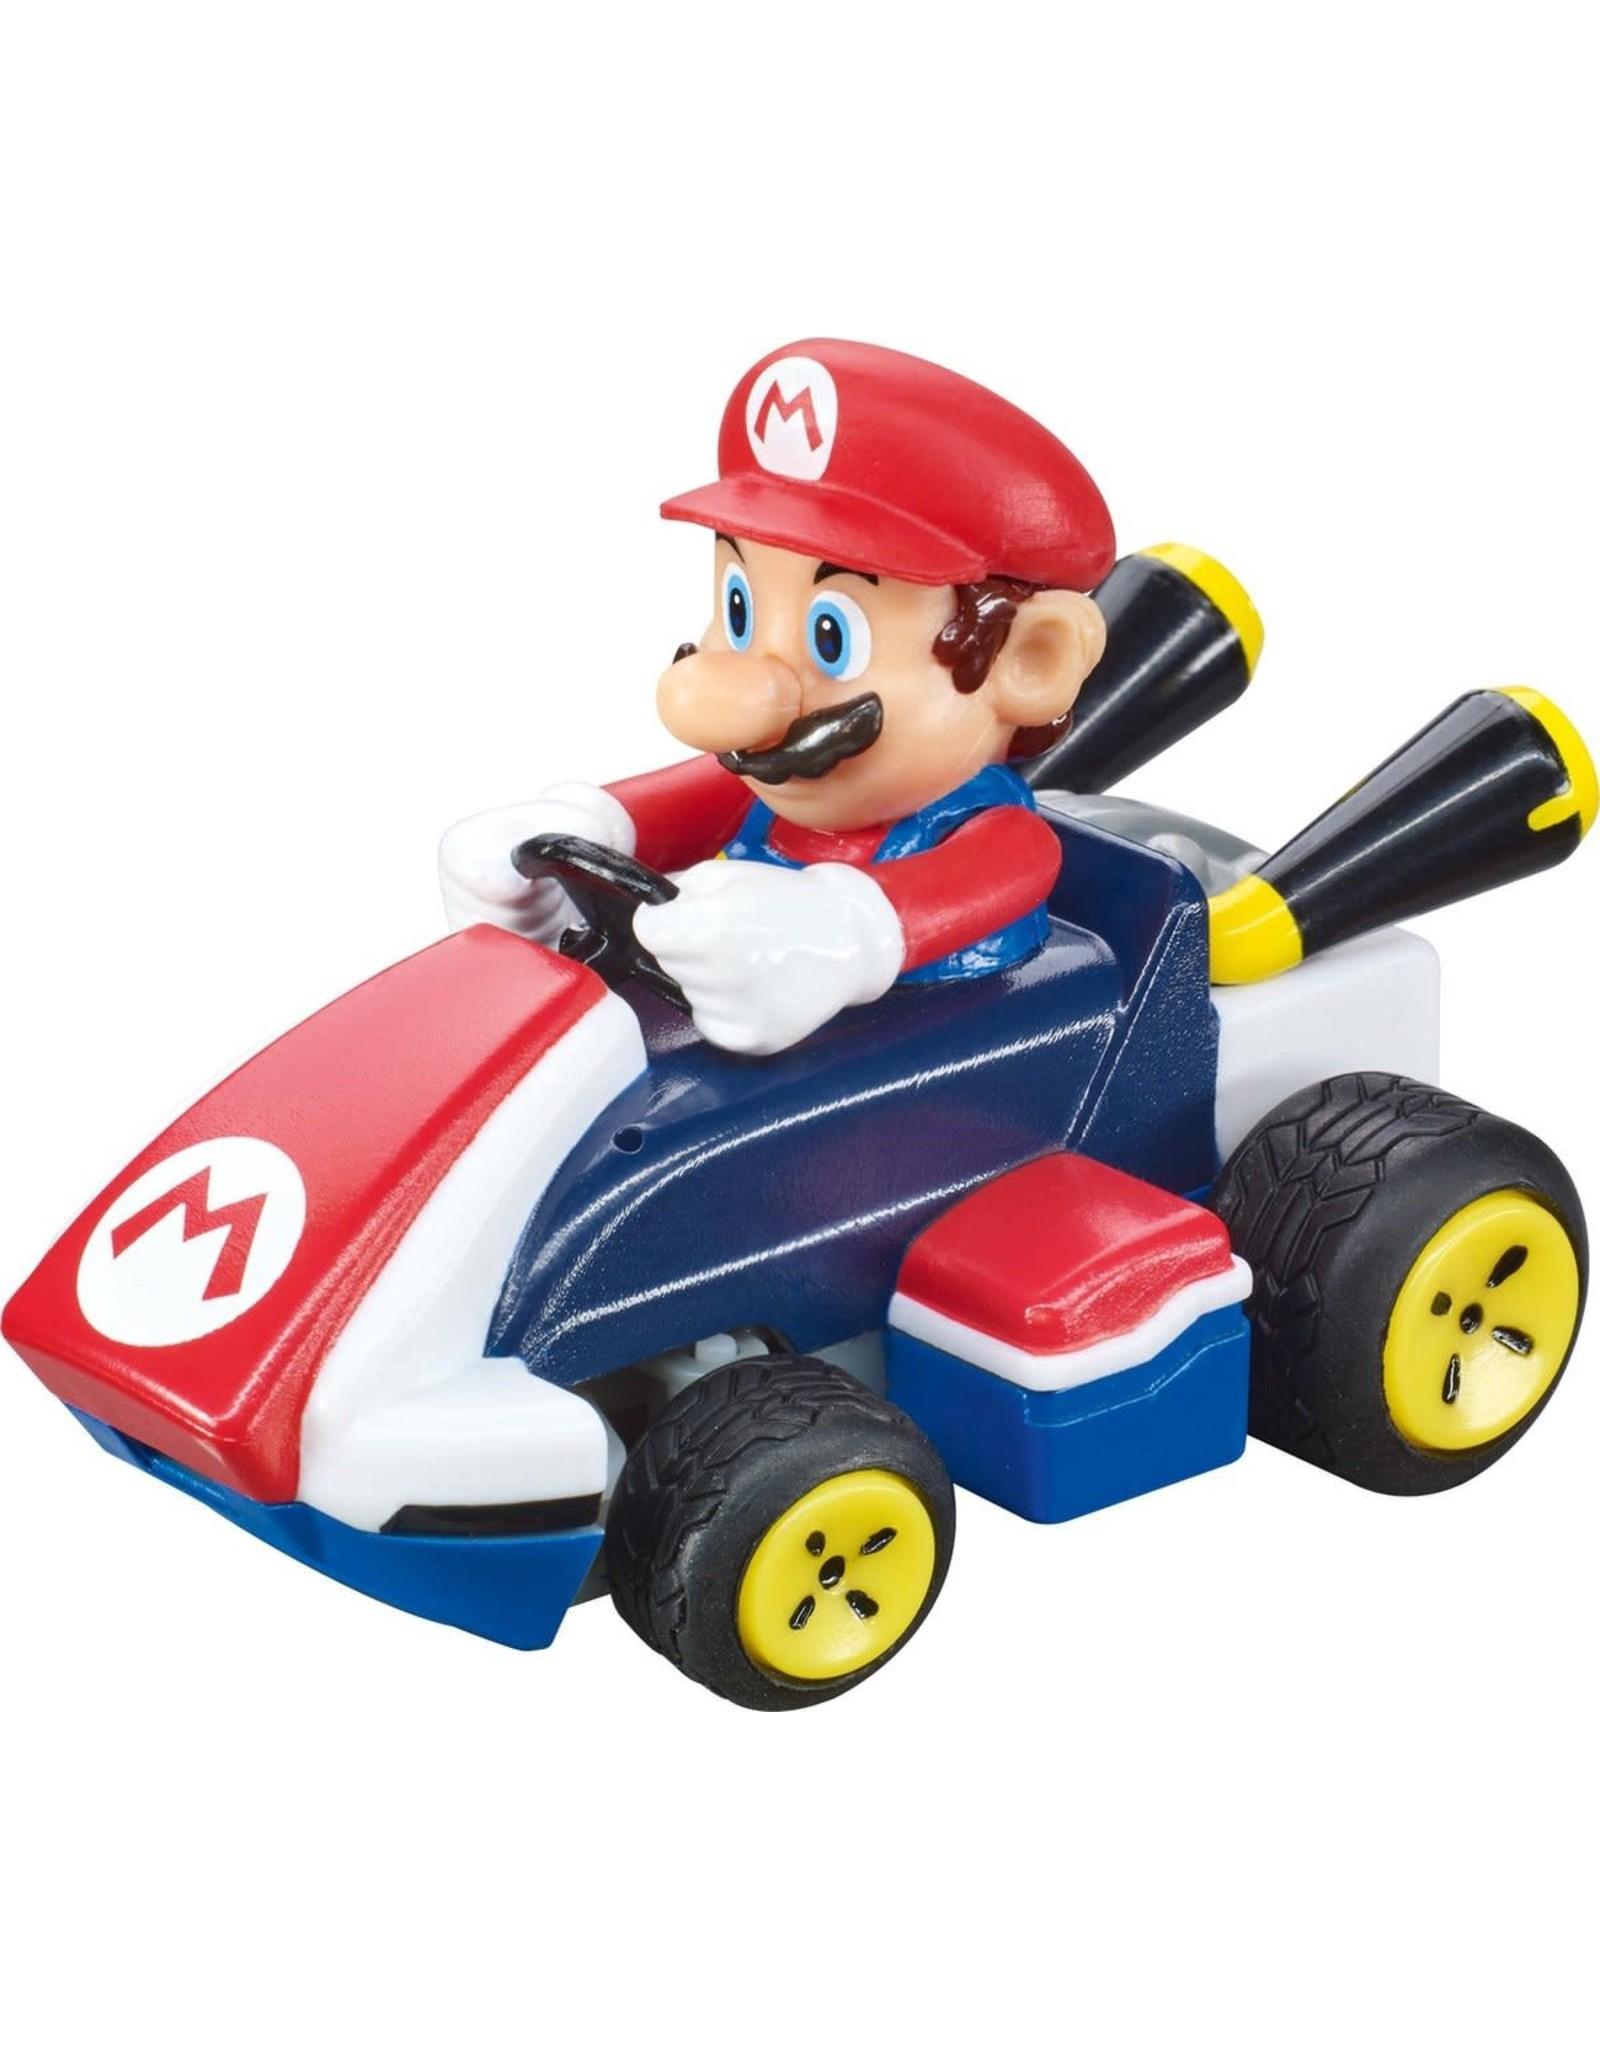 Carrera RC mini Carrera Mario Kart - Mario